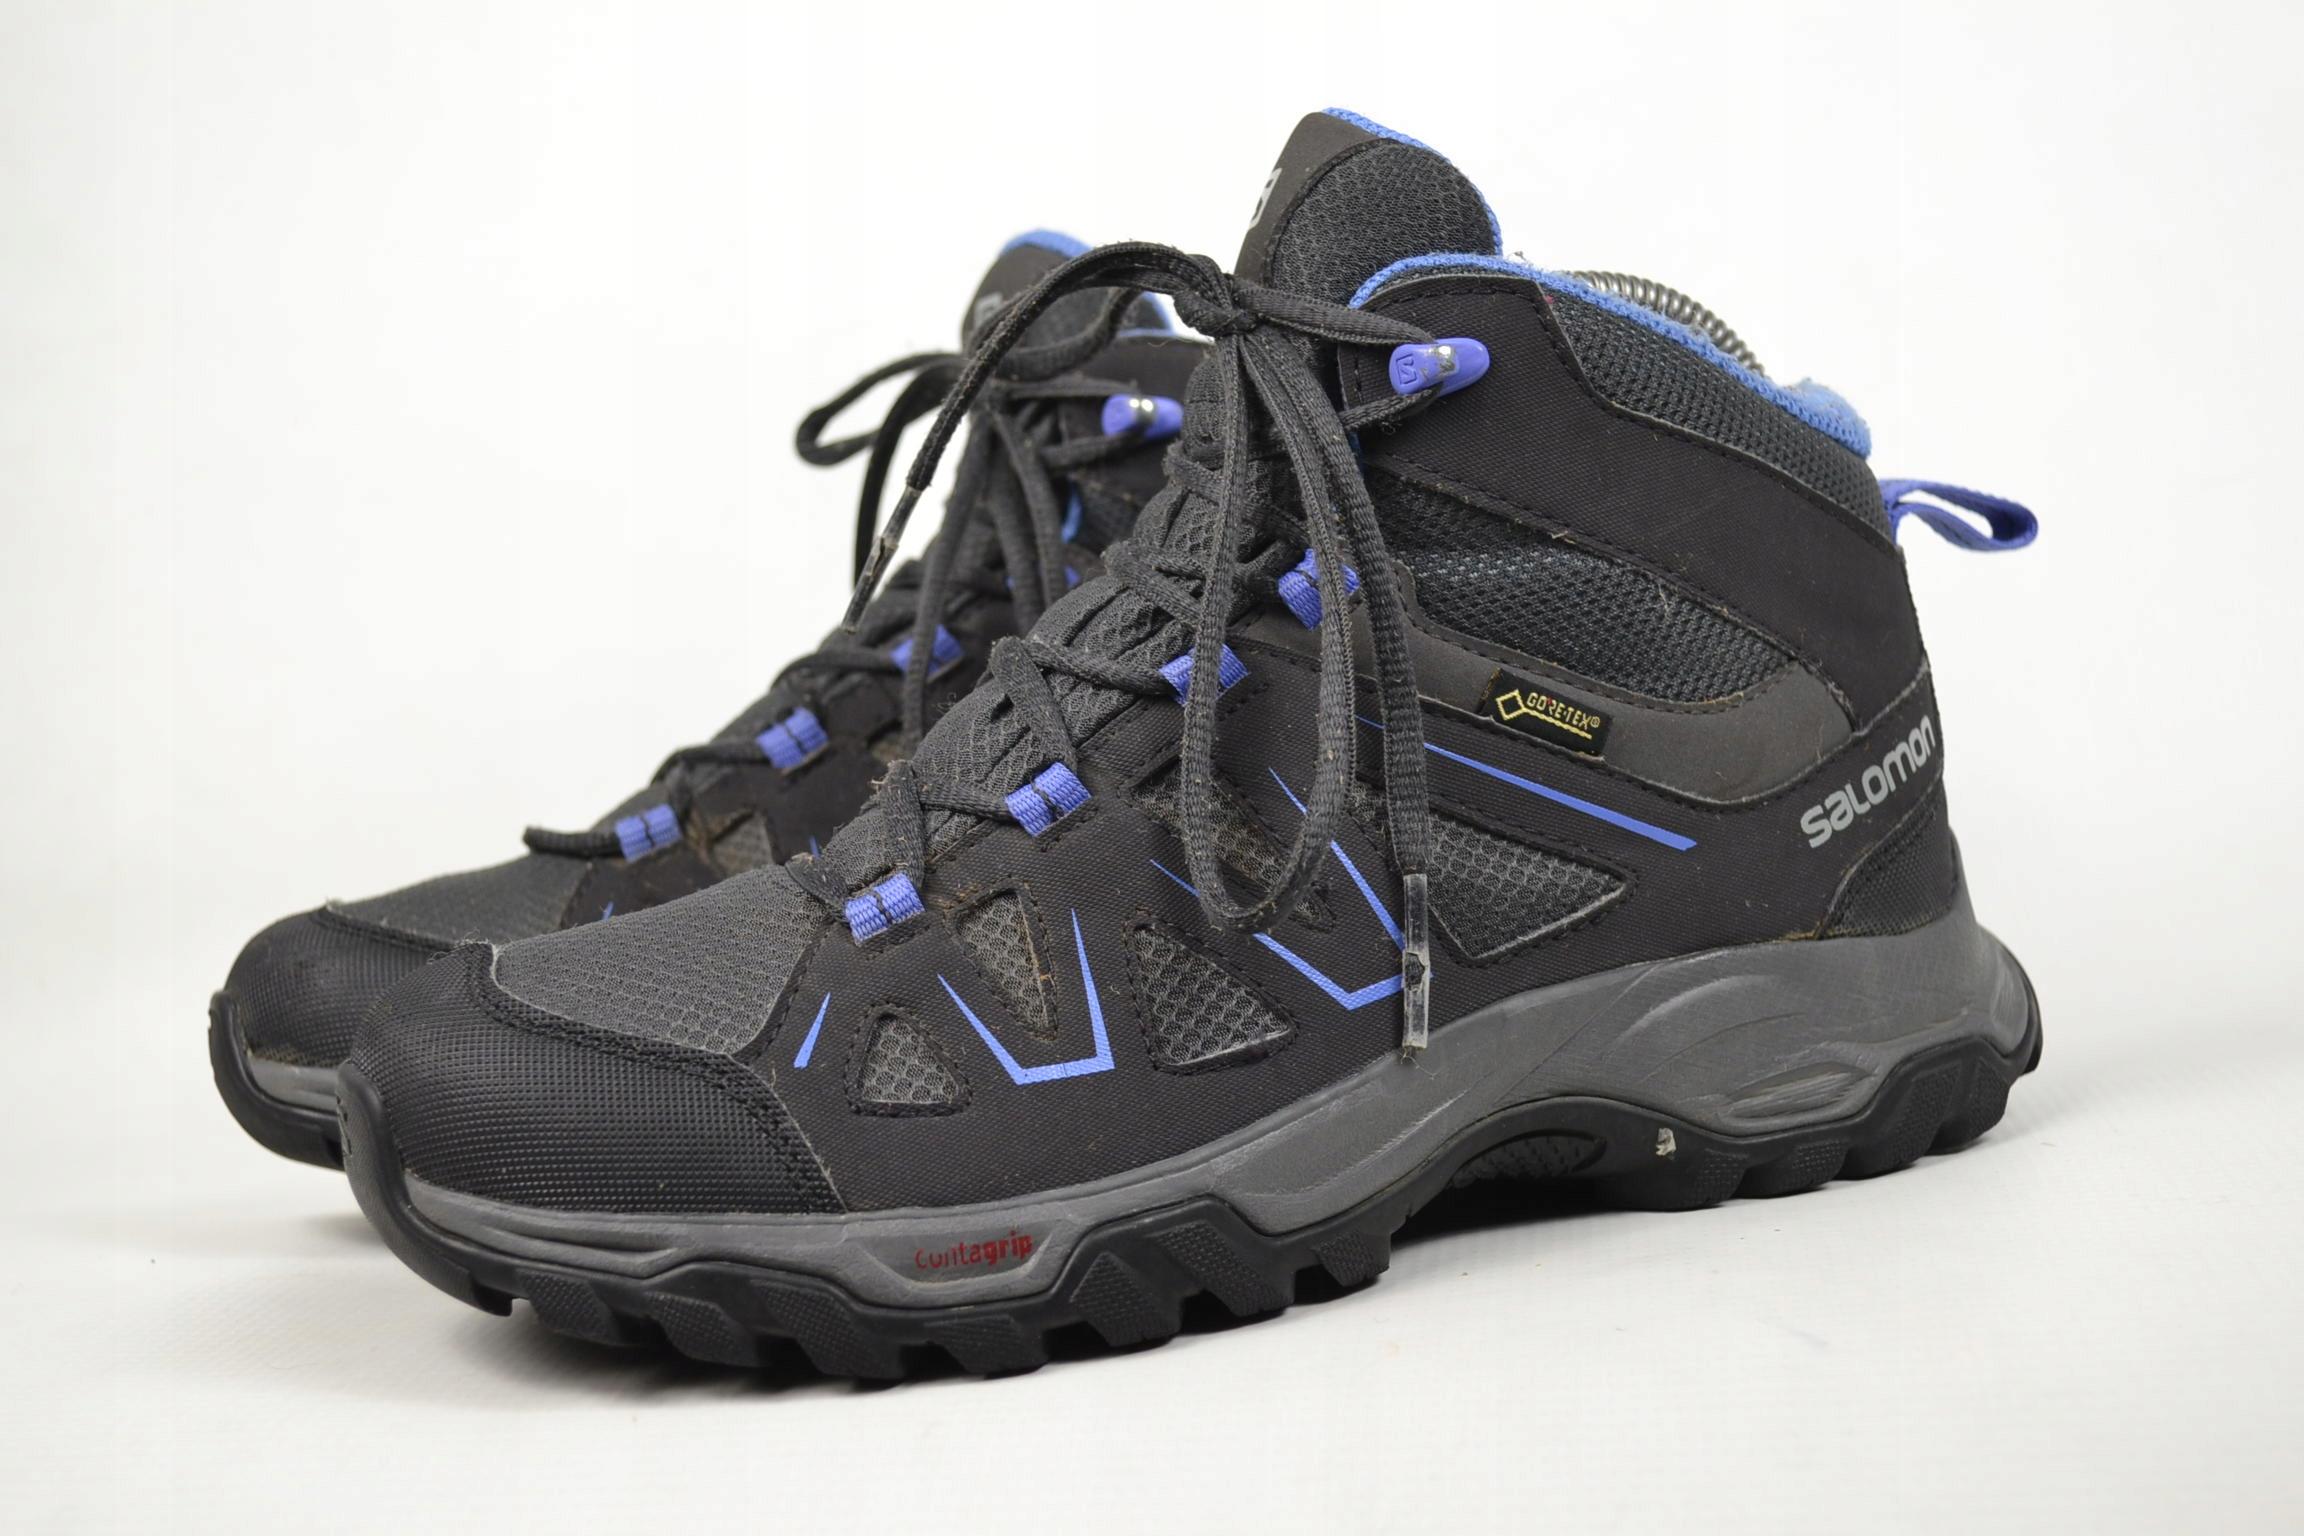 c6a63fb7 Buty trekkingowe SALOMON TIBAI MID GTX GORE-TEX 38 - 7627865099 ...